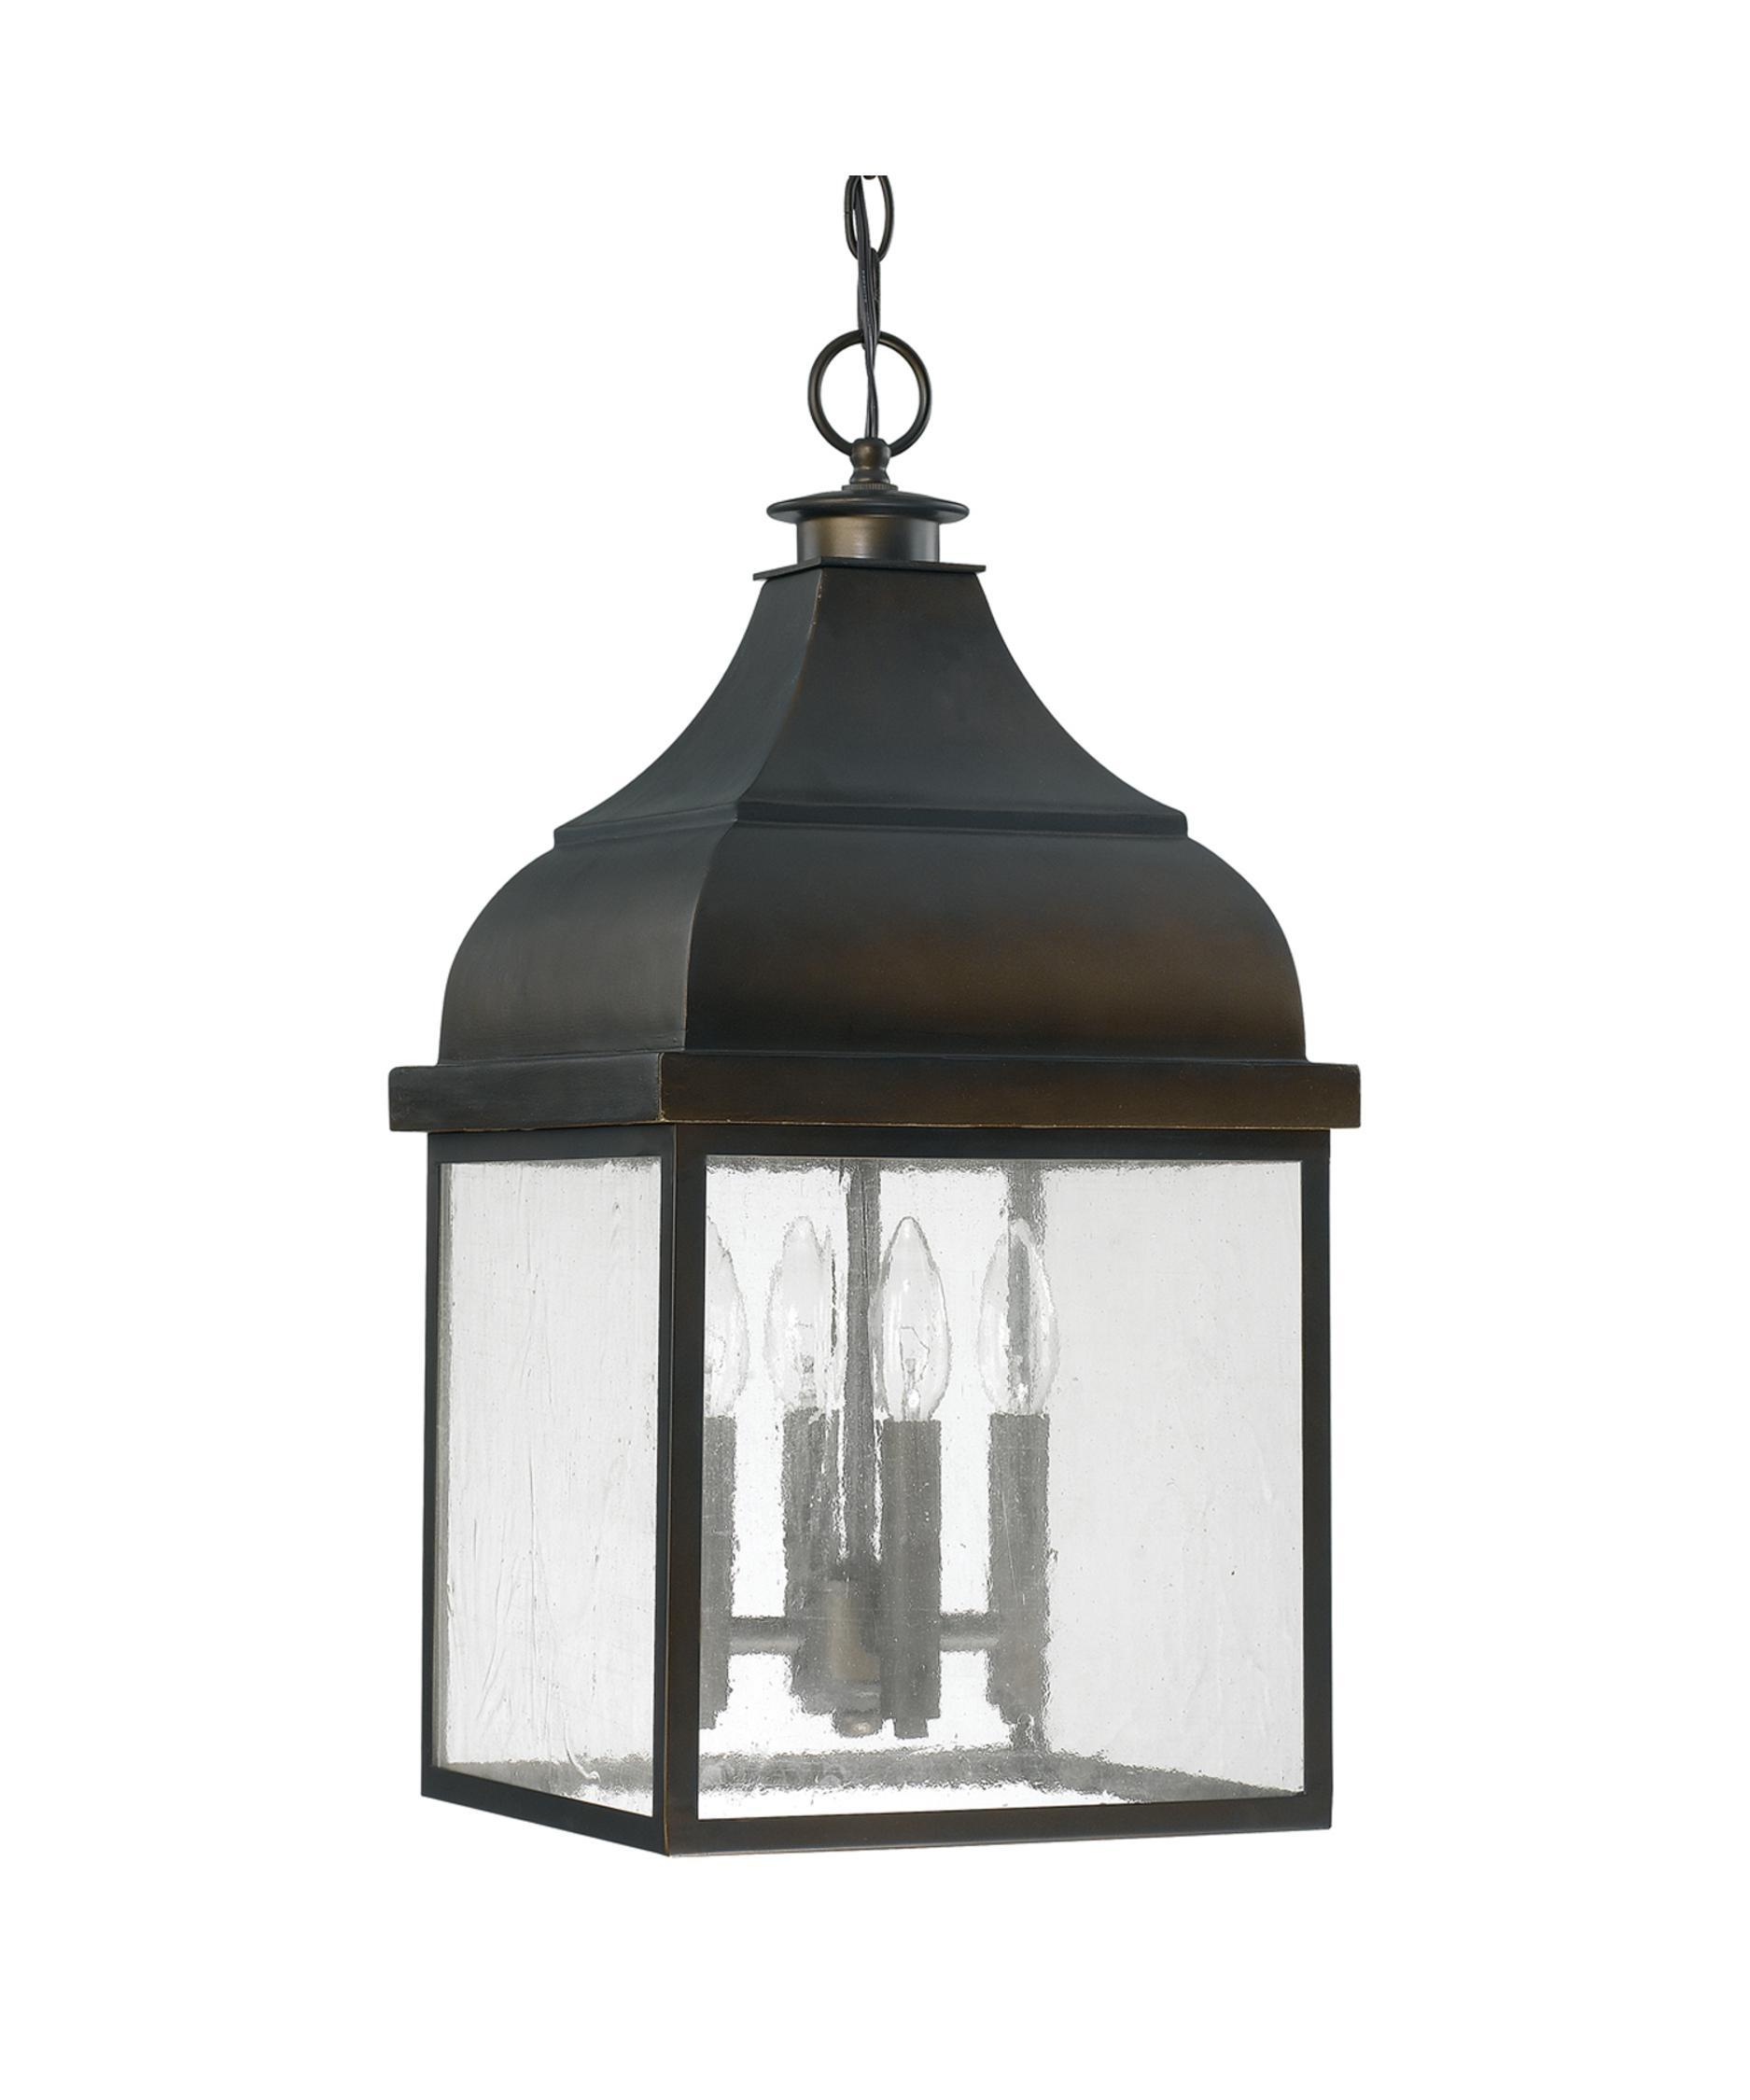 Outdoor Lanterns, Patio Lanterns, Outdoor Hanging Lanterns For Outdoor Hanging Coach Lights (View 9 of 15)